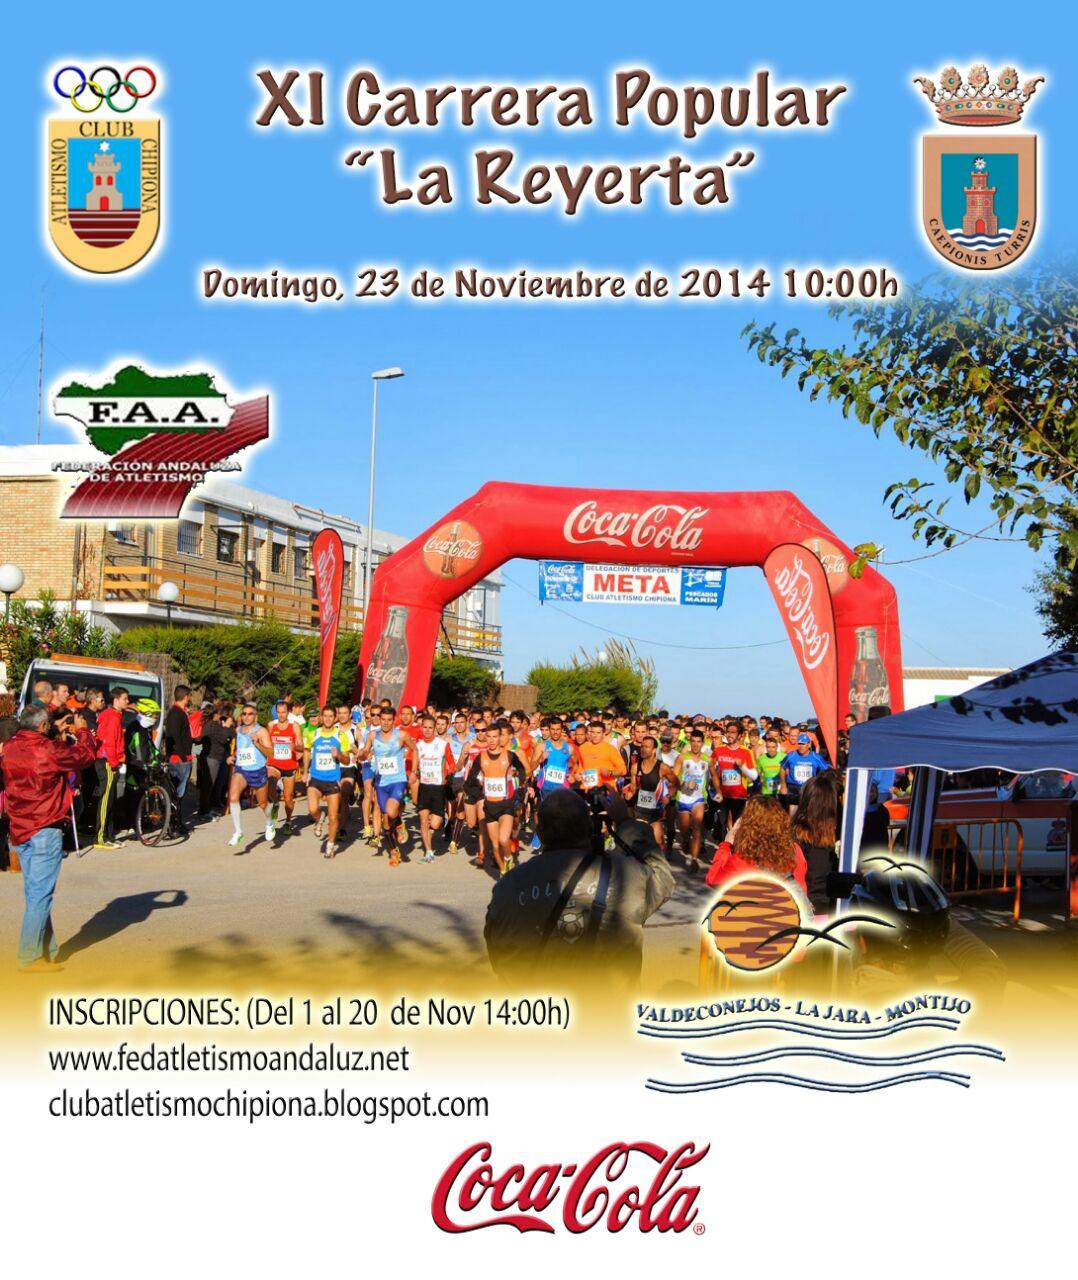 Carrera XI Carrera Popular La Reyerta